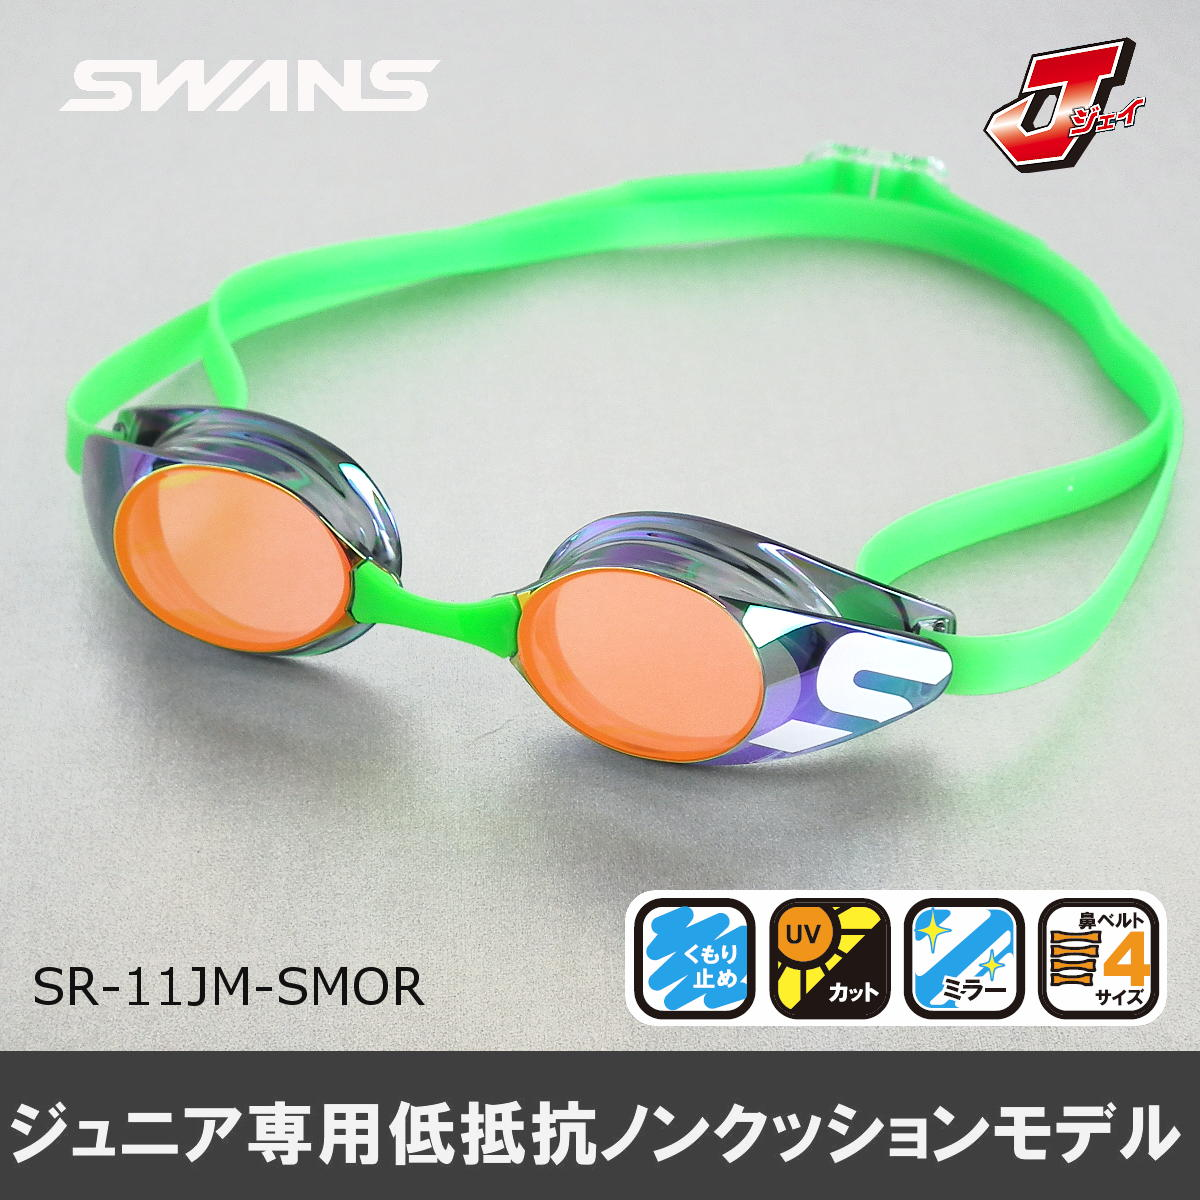 【SR-11JM-SMOR】SWANS(スワンズ)ノンクッションジュニアレーシングスイムゴーグル(ミラータイプ)[FINA承認モデル/ゴーグル/水泳/子供]